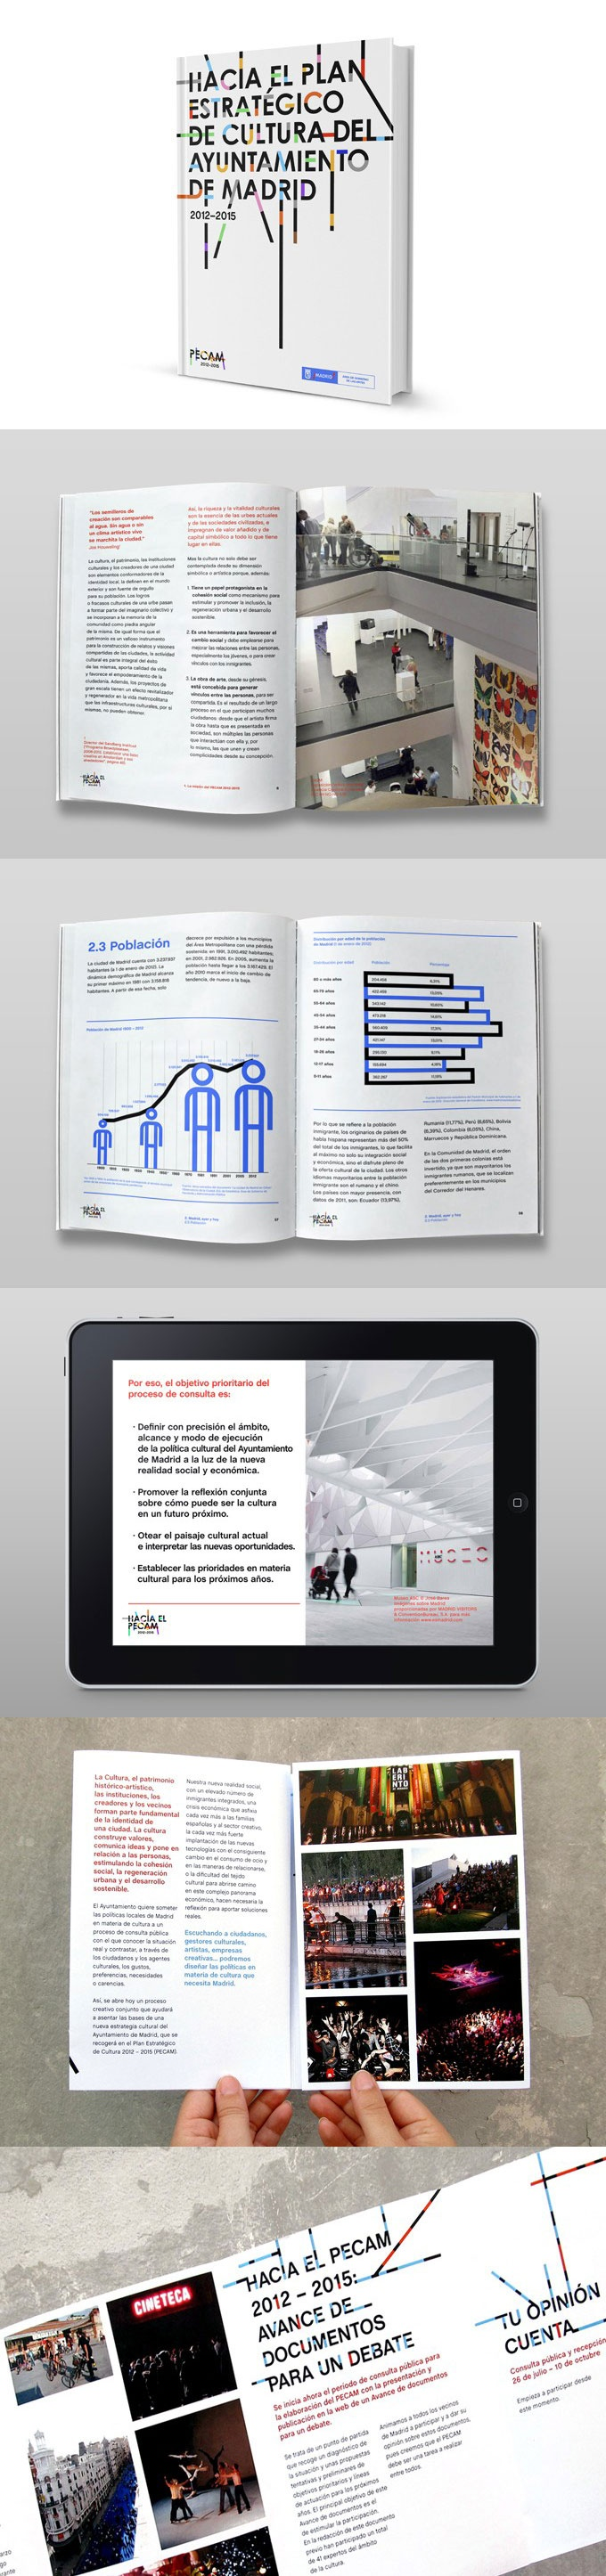 Best Strategic Planning Images On   Strategic